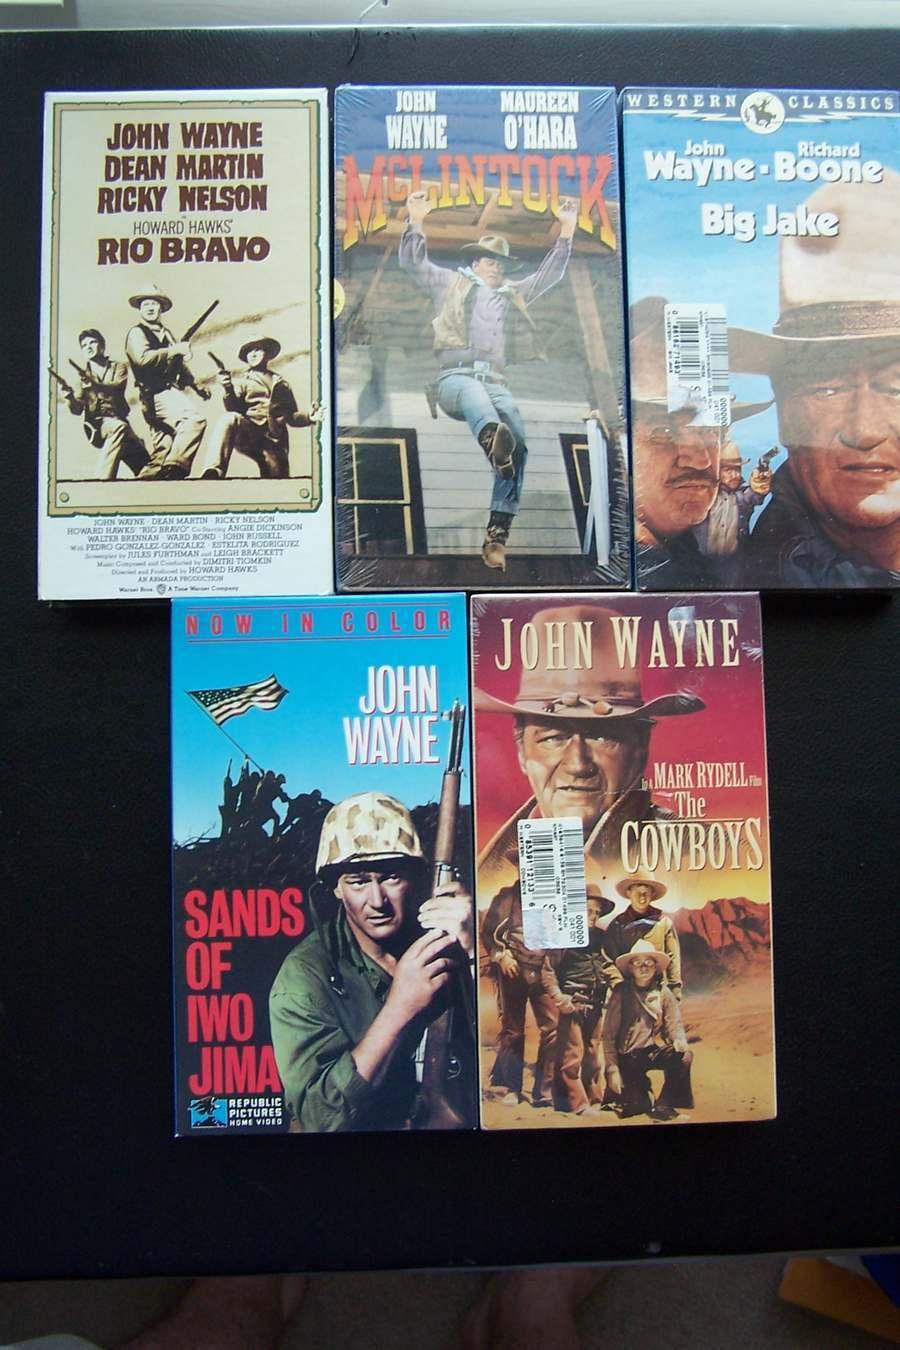 John Wayne 5 VHS Lot McLintock, Rio Bravo, Big Jake, Co